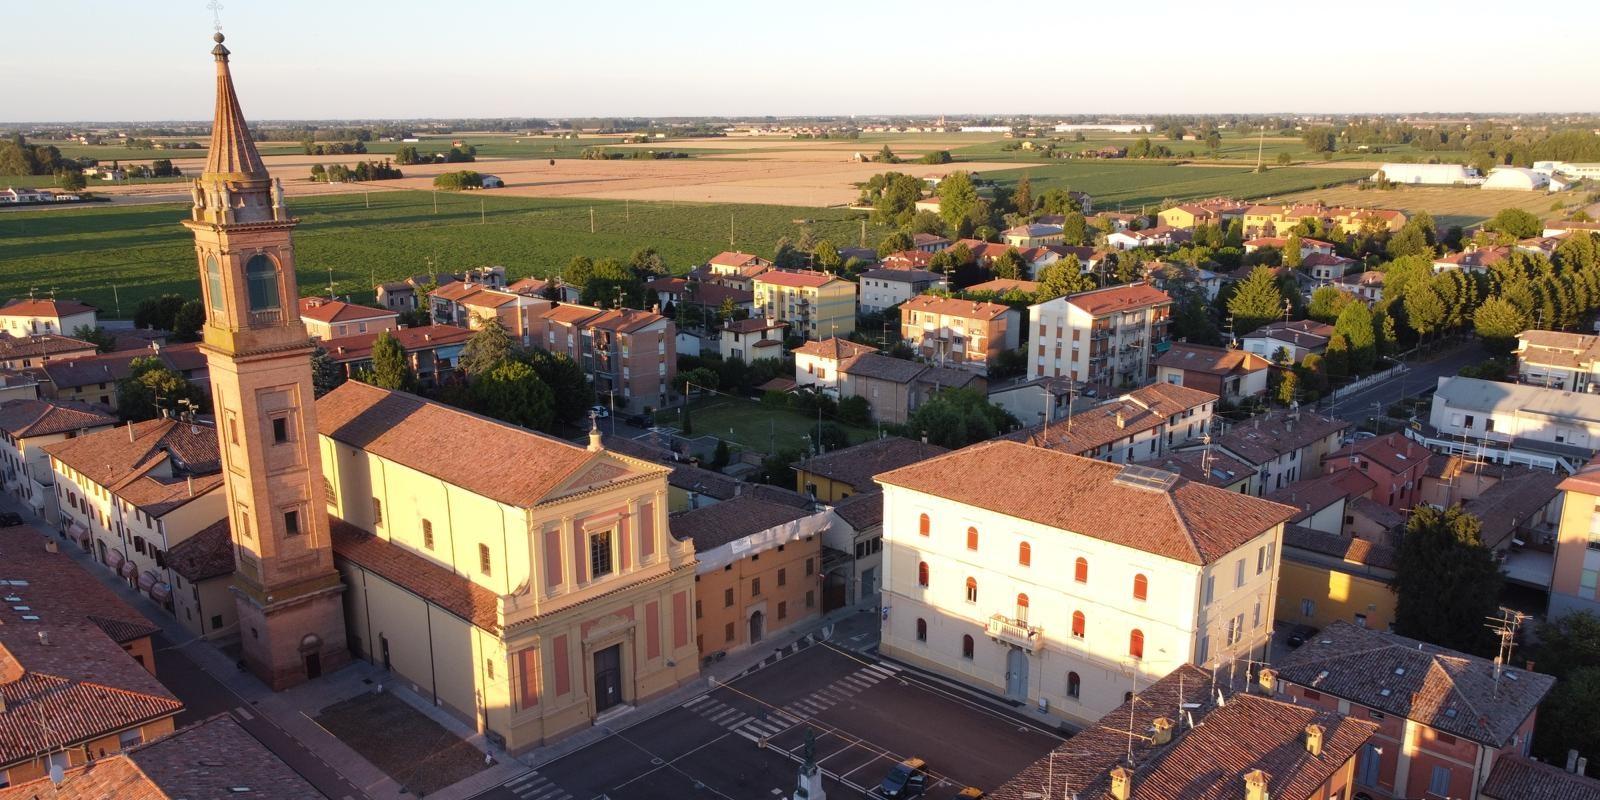 Piazza di Castello d'Argile